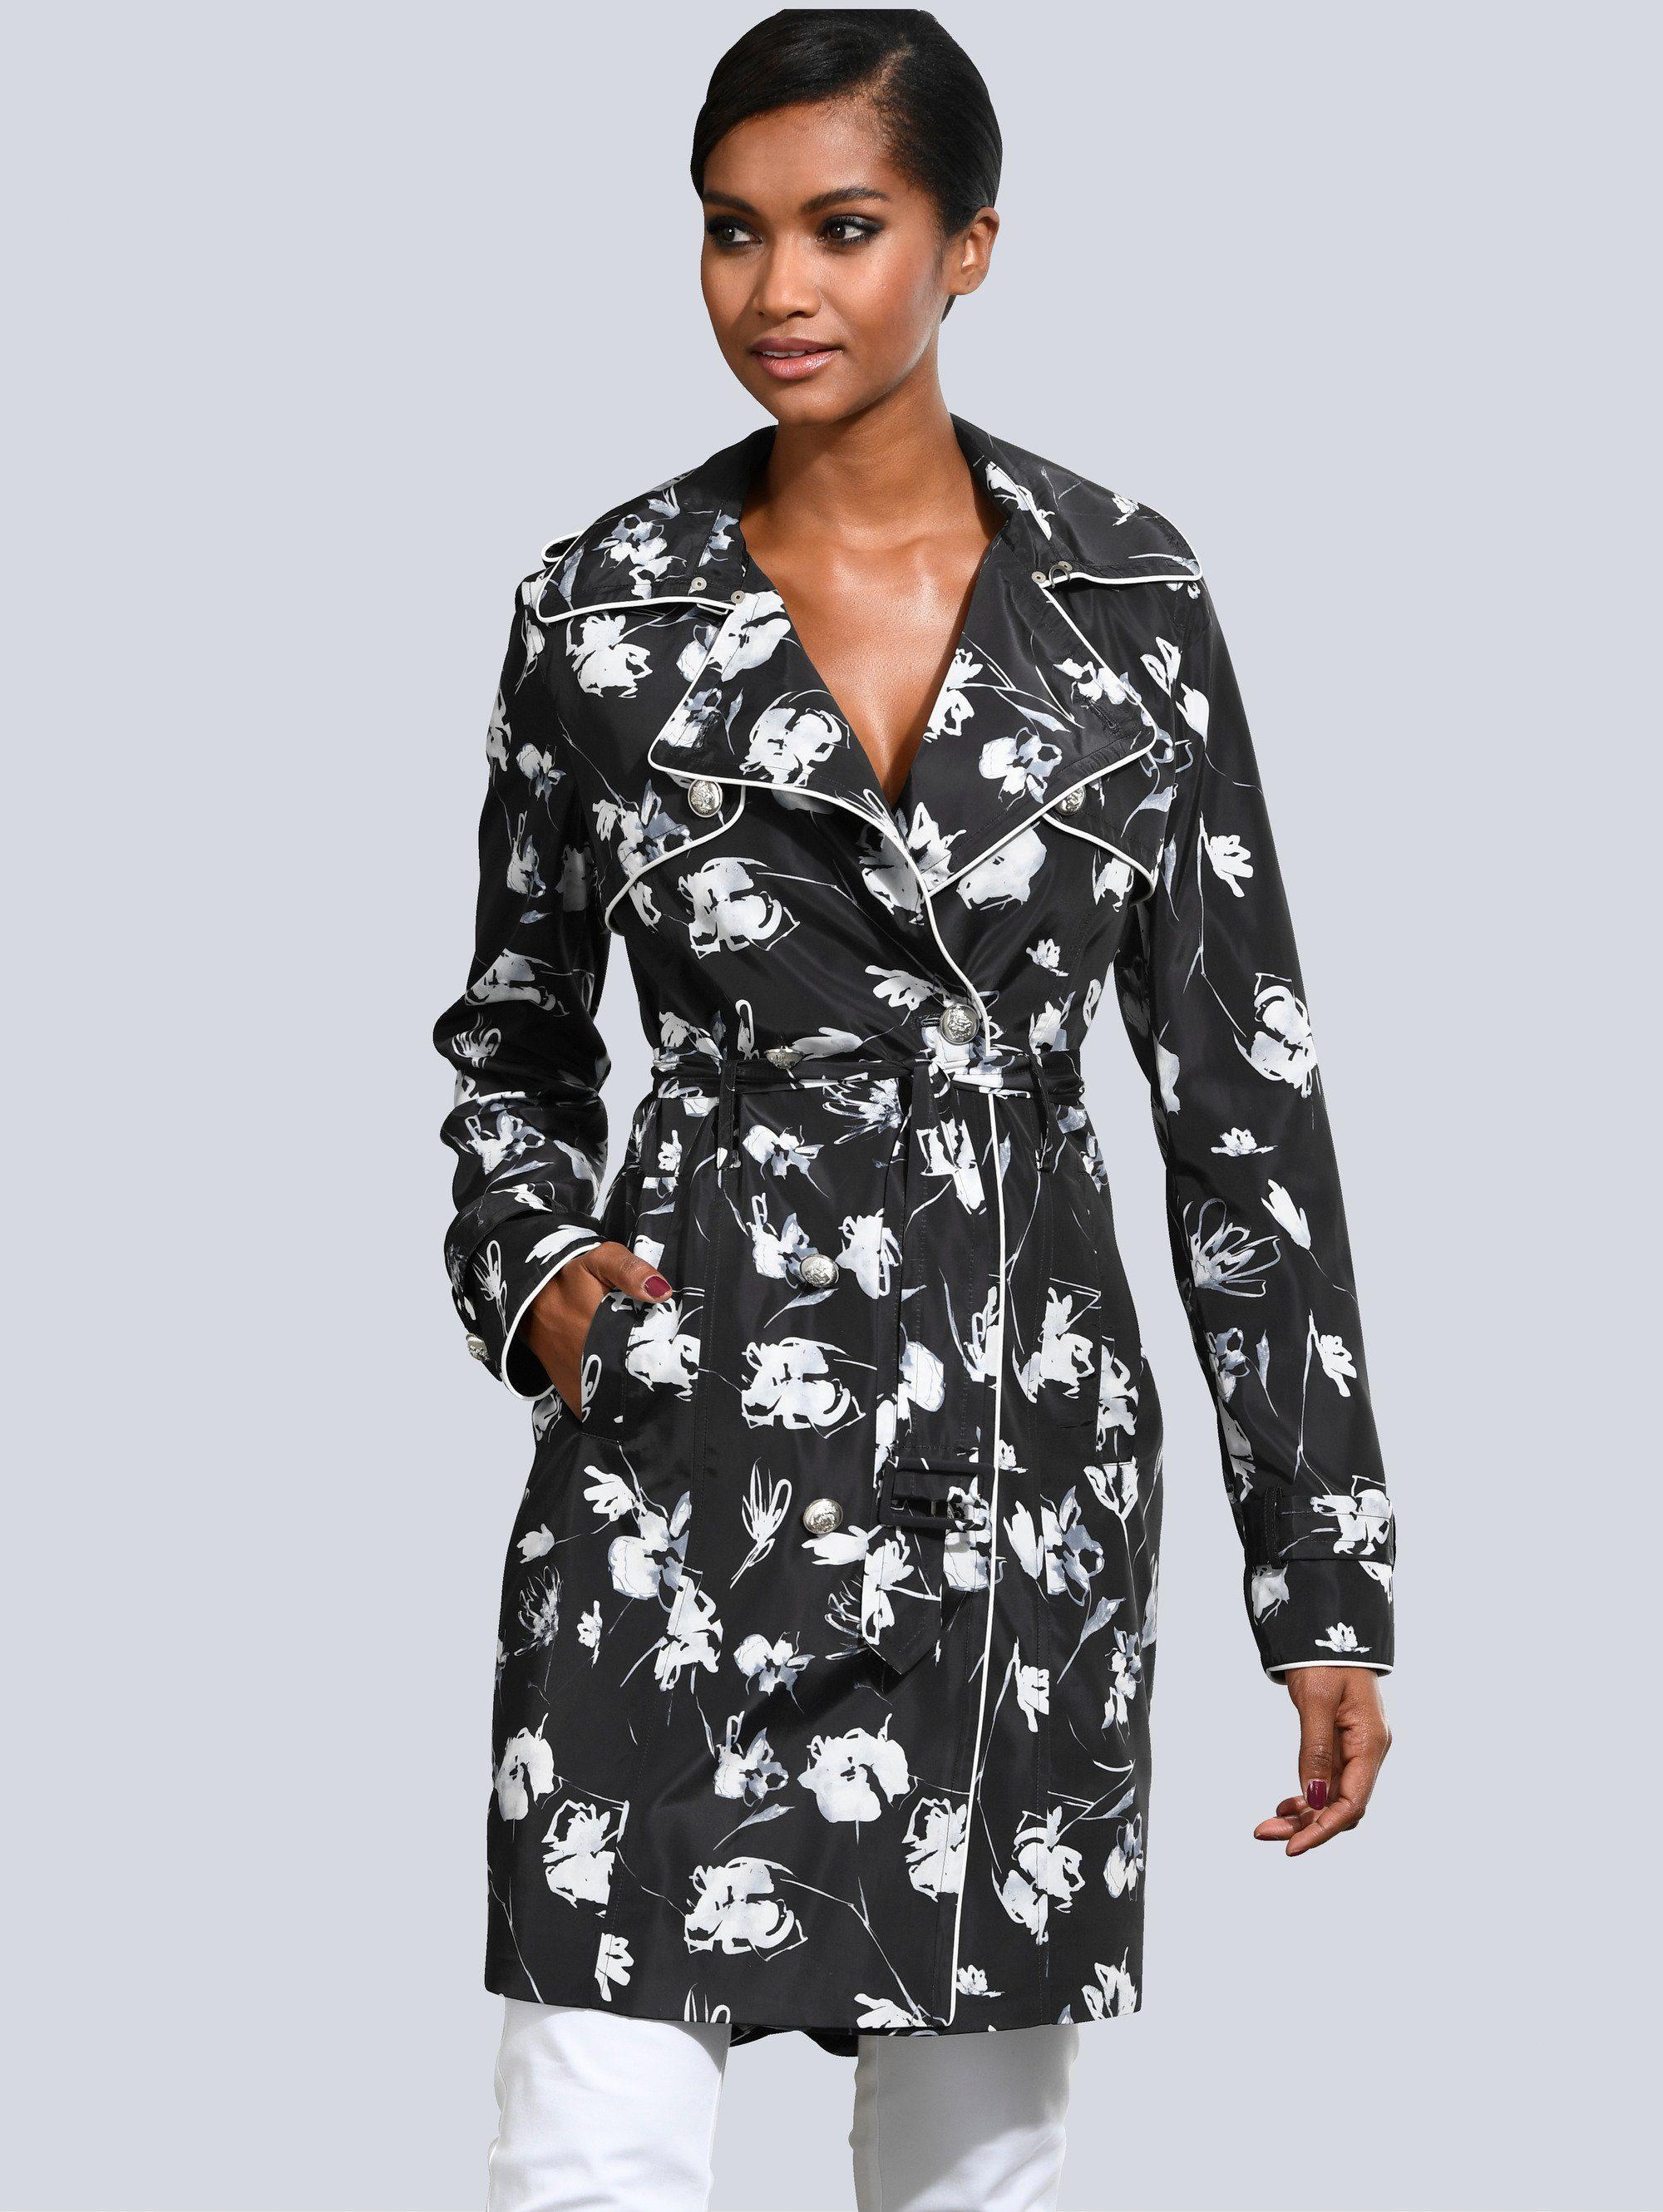 Alba Moda Trenchcoat im exklusiven Alba Moda Print | Bekleidung > Mäntel > Trenchcoats | Schwarz - Weiß | Polyester | ALBA MODA